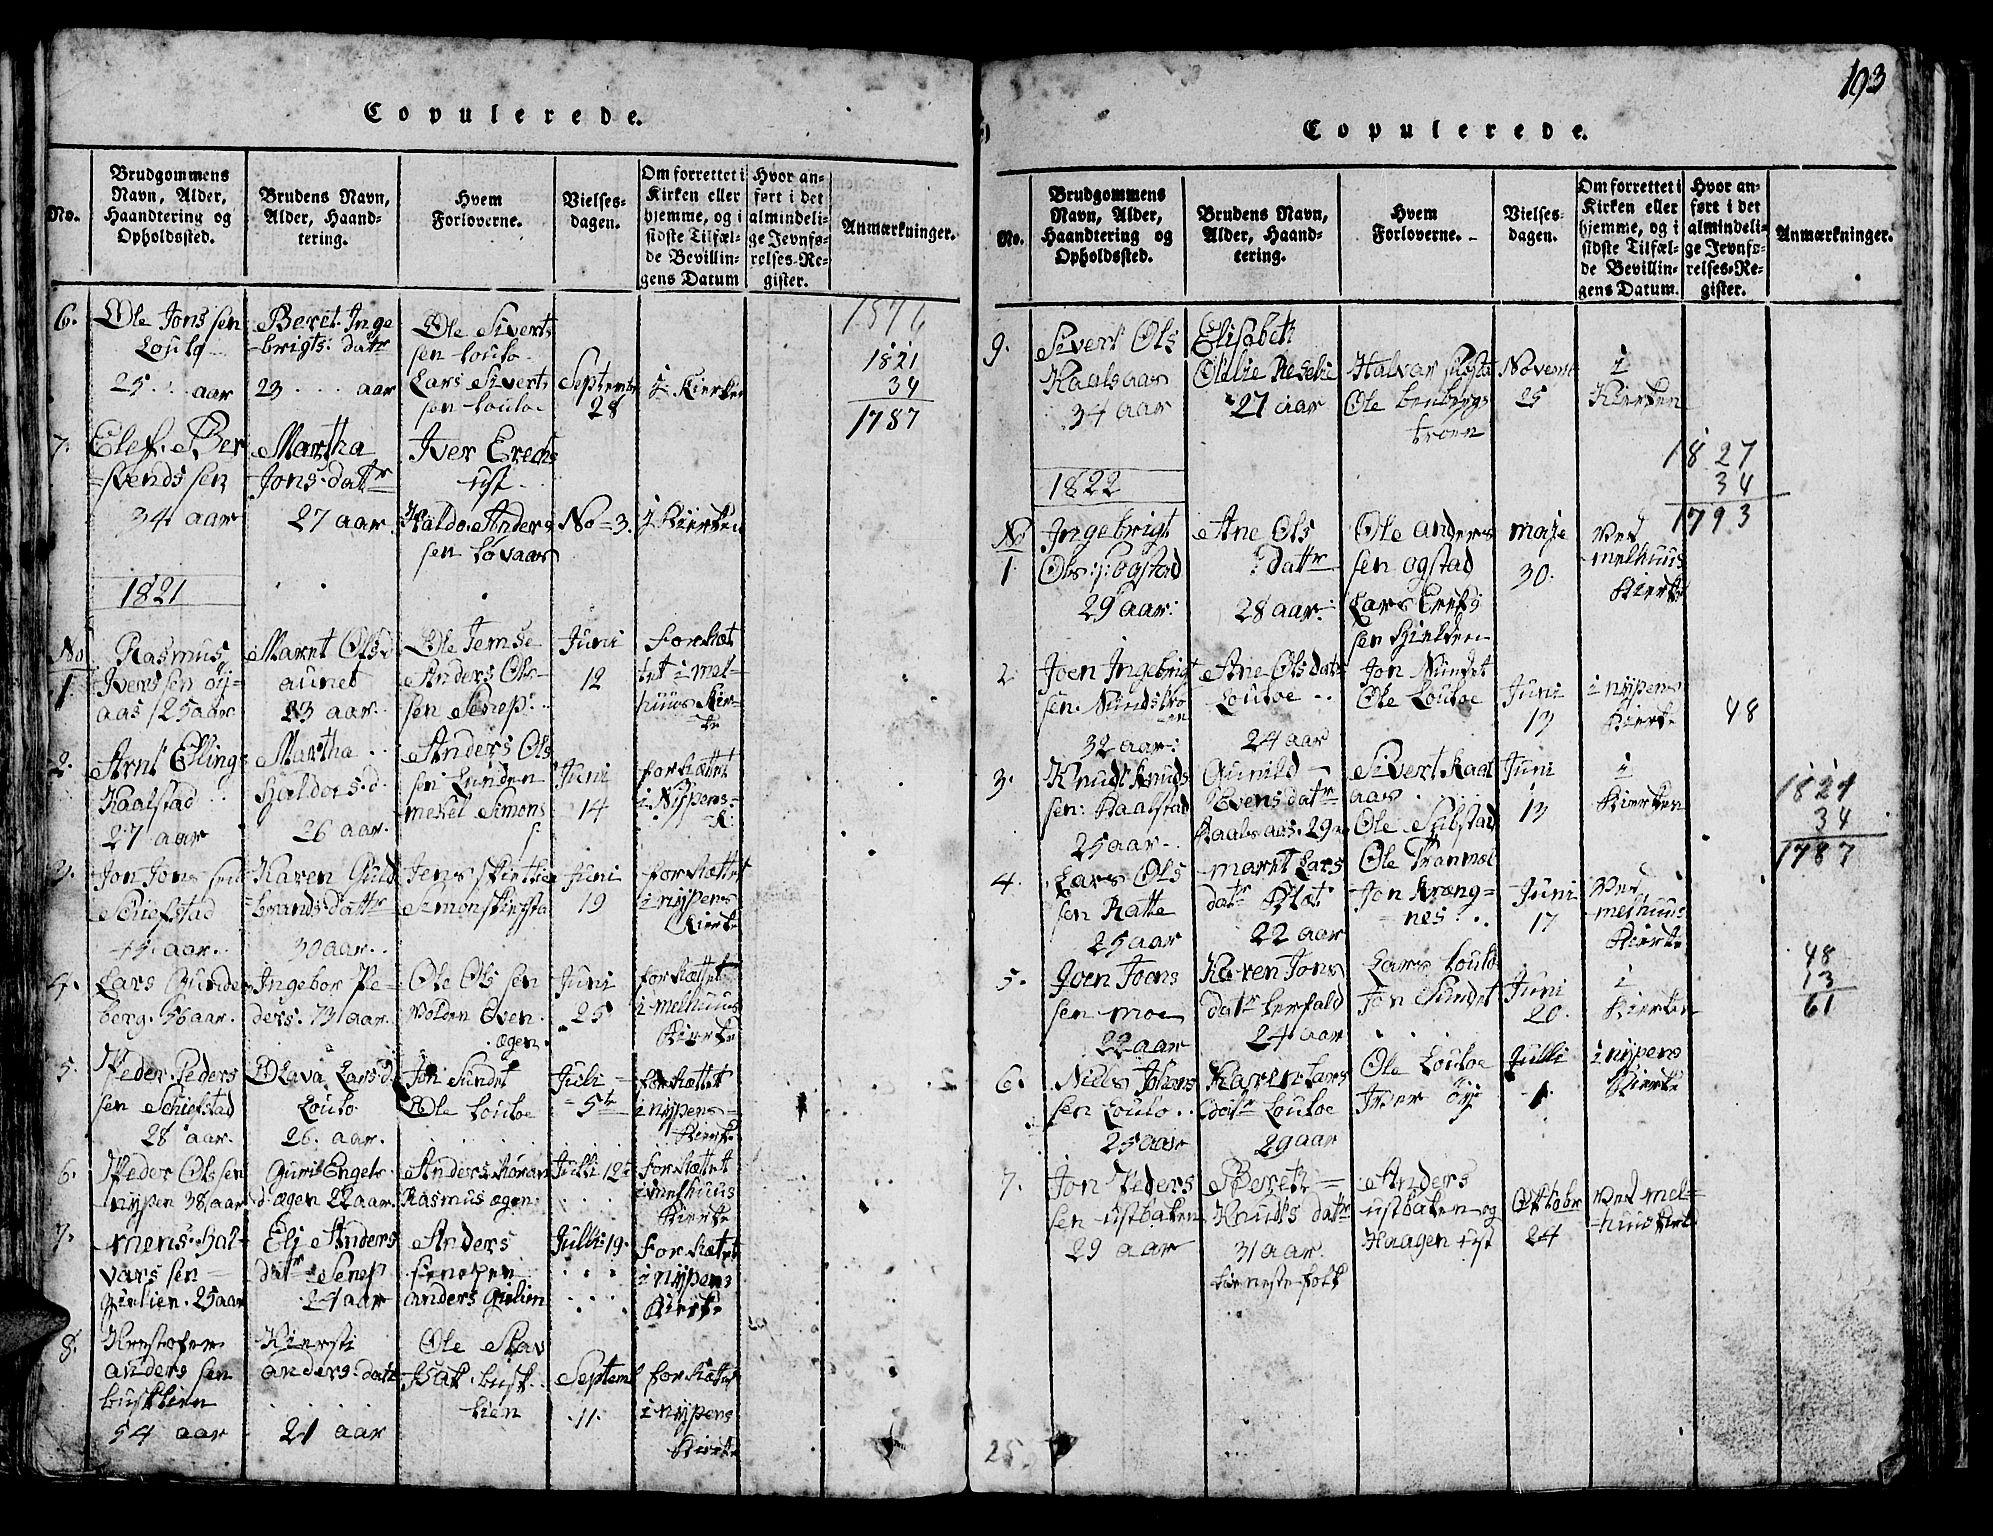 SAT, Ministerialprotokoller, klokkerbøker og fødselsregistre - Sør-Trøndelag, 613/L0393: Parish register (copy) no. 613C01, 1816-1886, p. 193